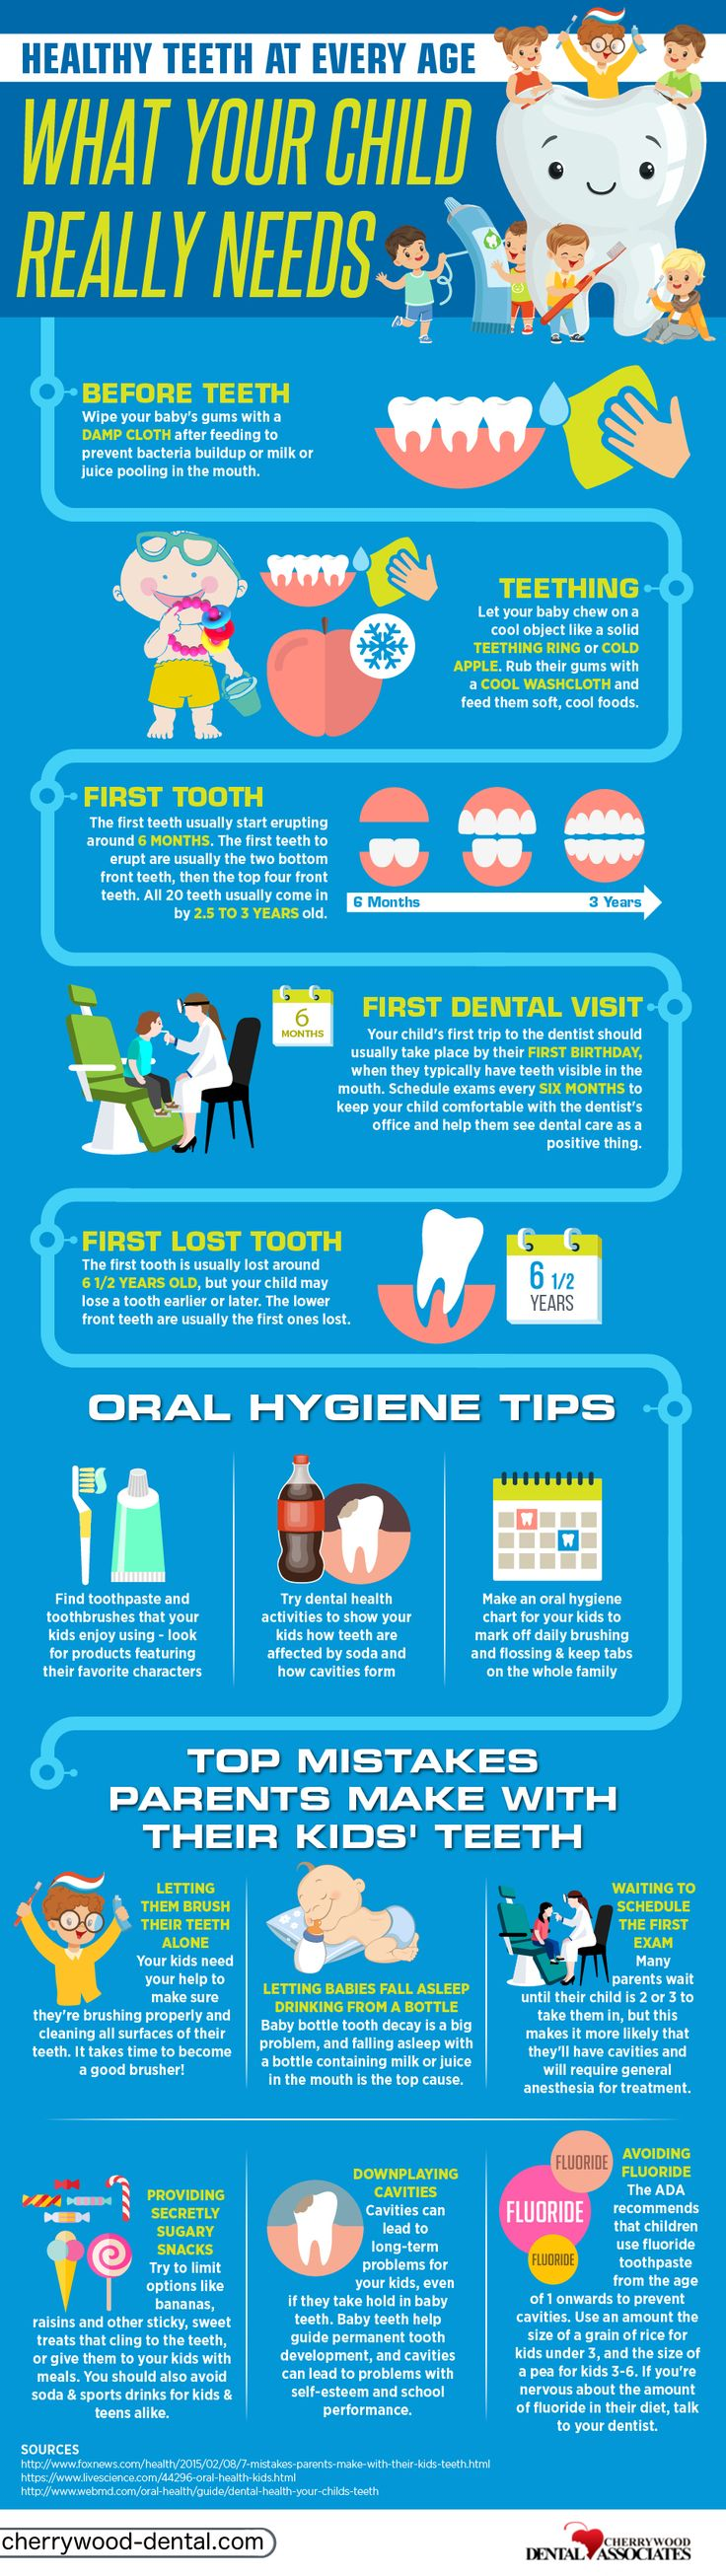 The Quickest & Easiest Way to Help Your Kids Avoid Cavities #blog #kids #cavities #teeth #health